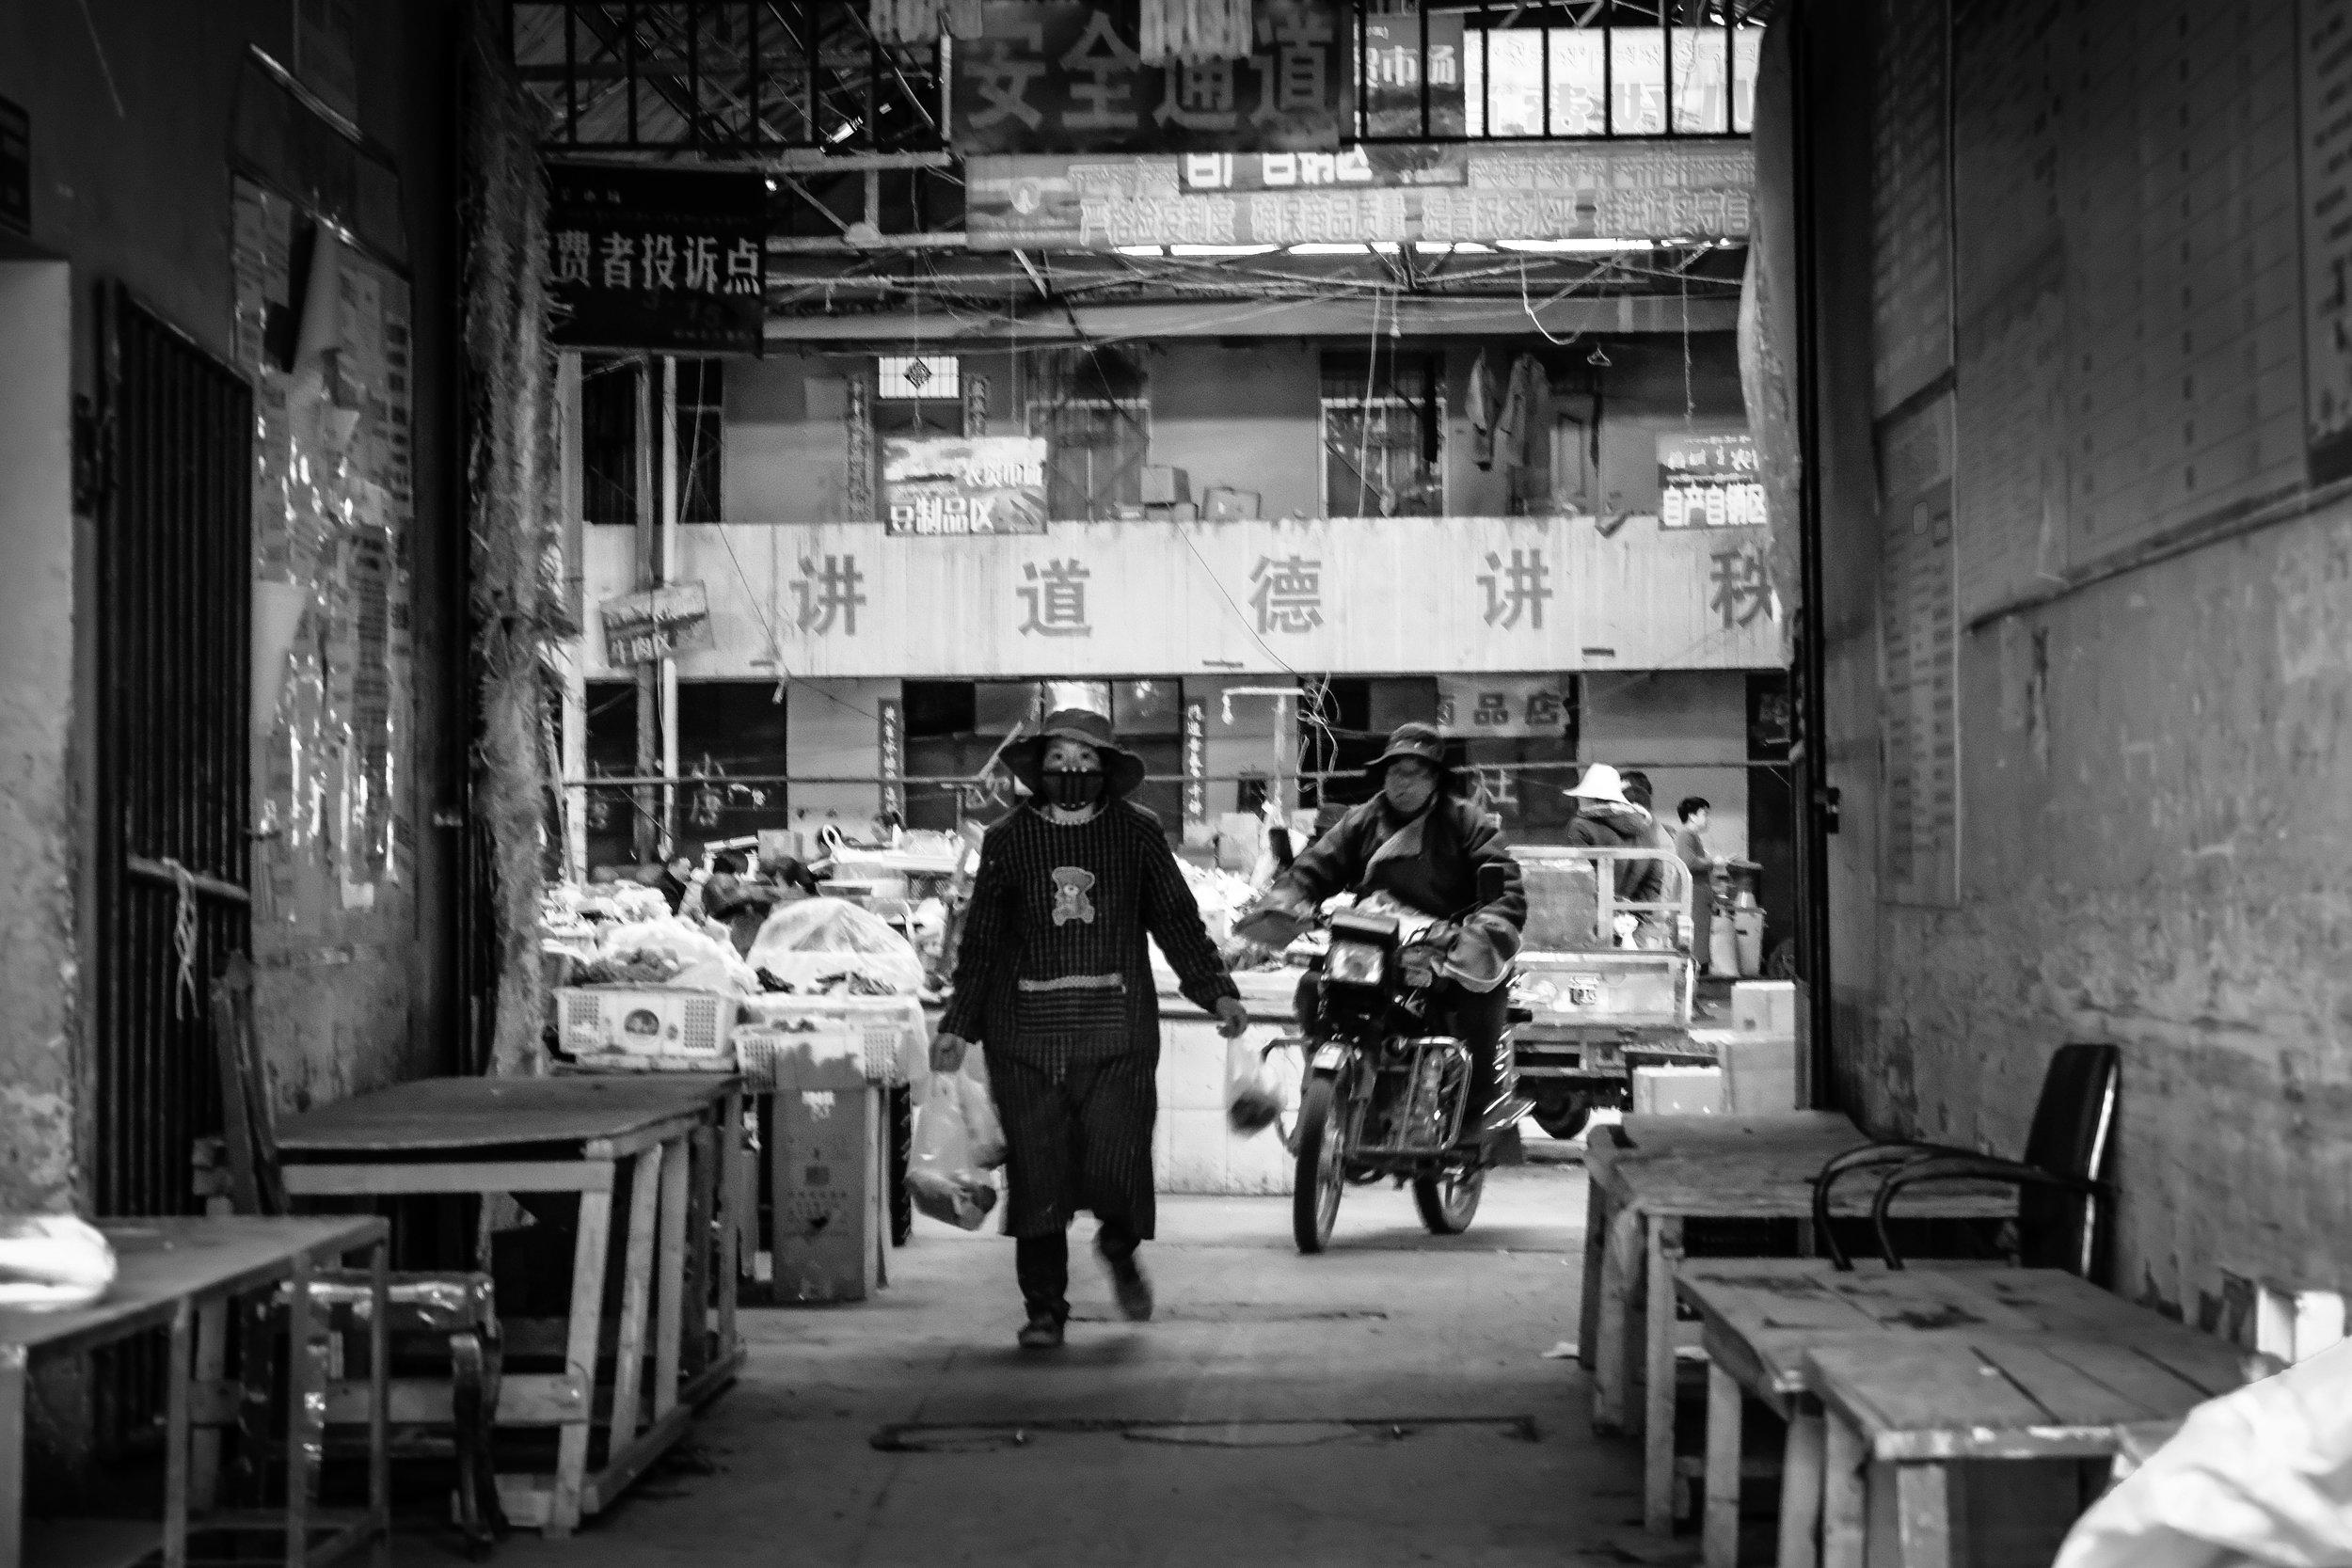 Yading-Daocheng-Litang-3160.jpg